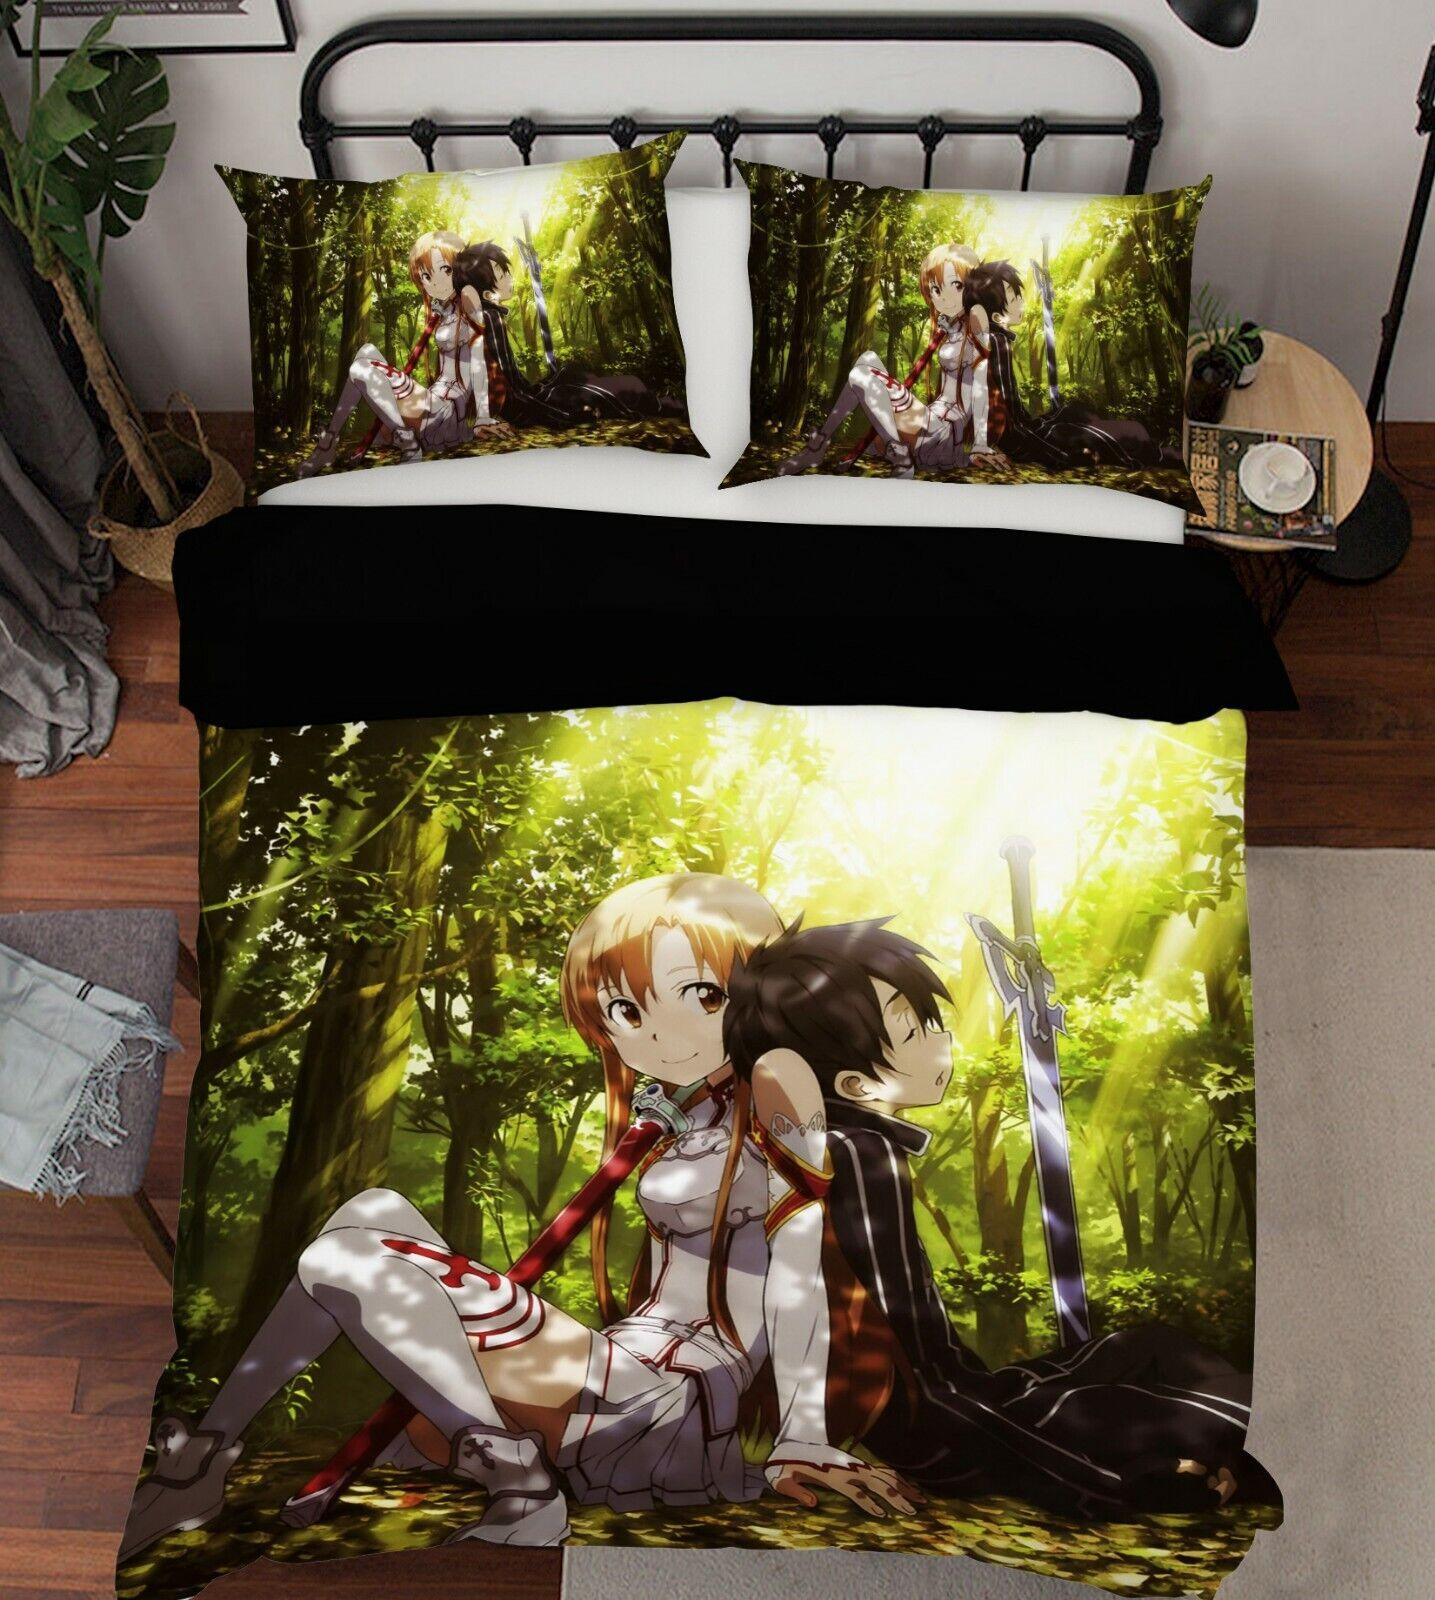 3D Sword Art Online O895 Japan Anime Bed PilFaiblecases Quilt Cover Duvet Amy